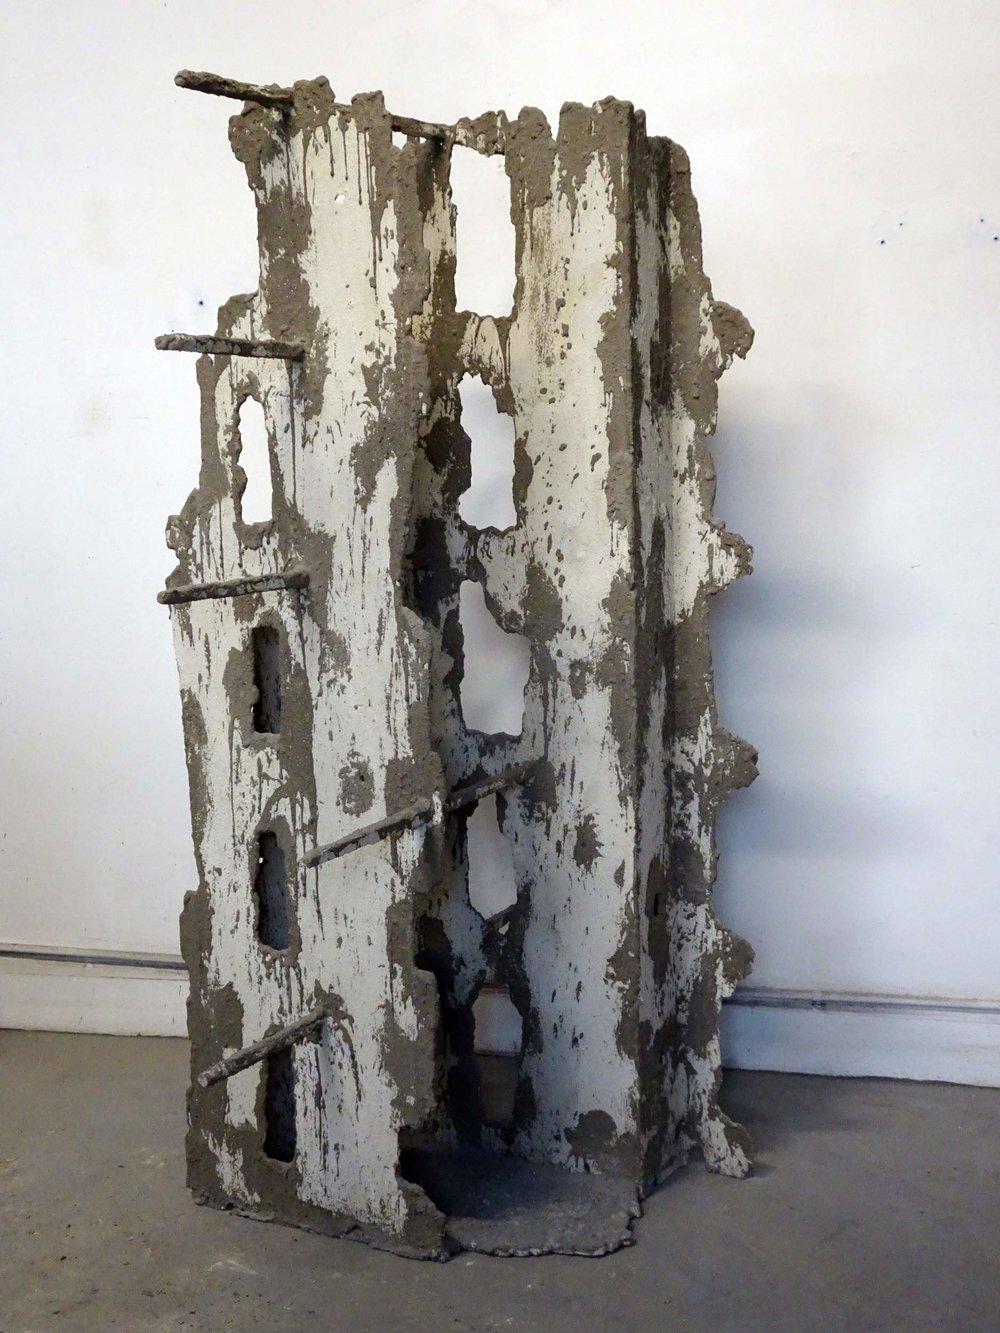 osip-sculpture_avenida-de-la-perfidia_view2.jpg